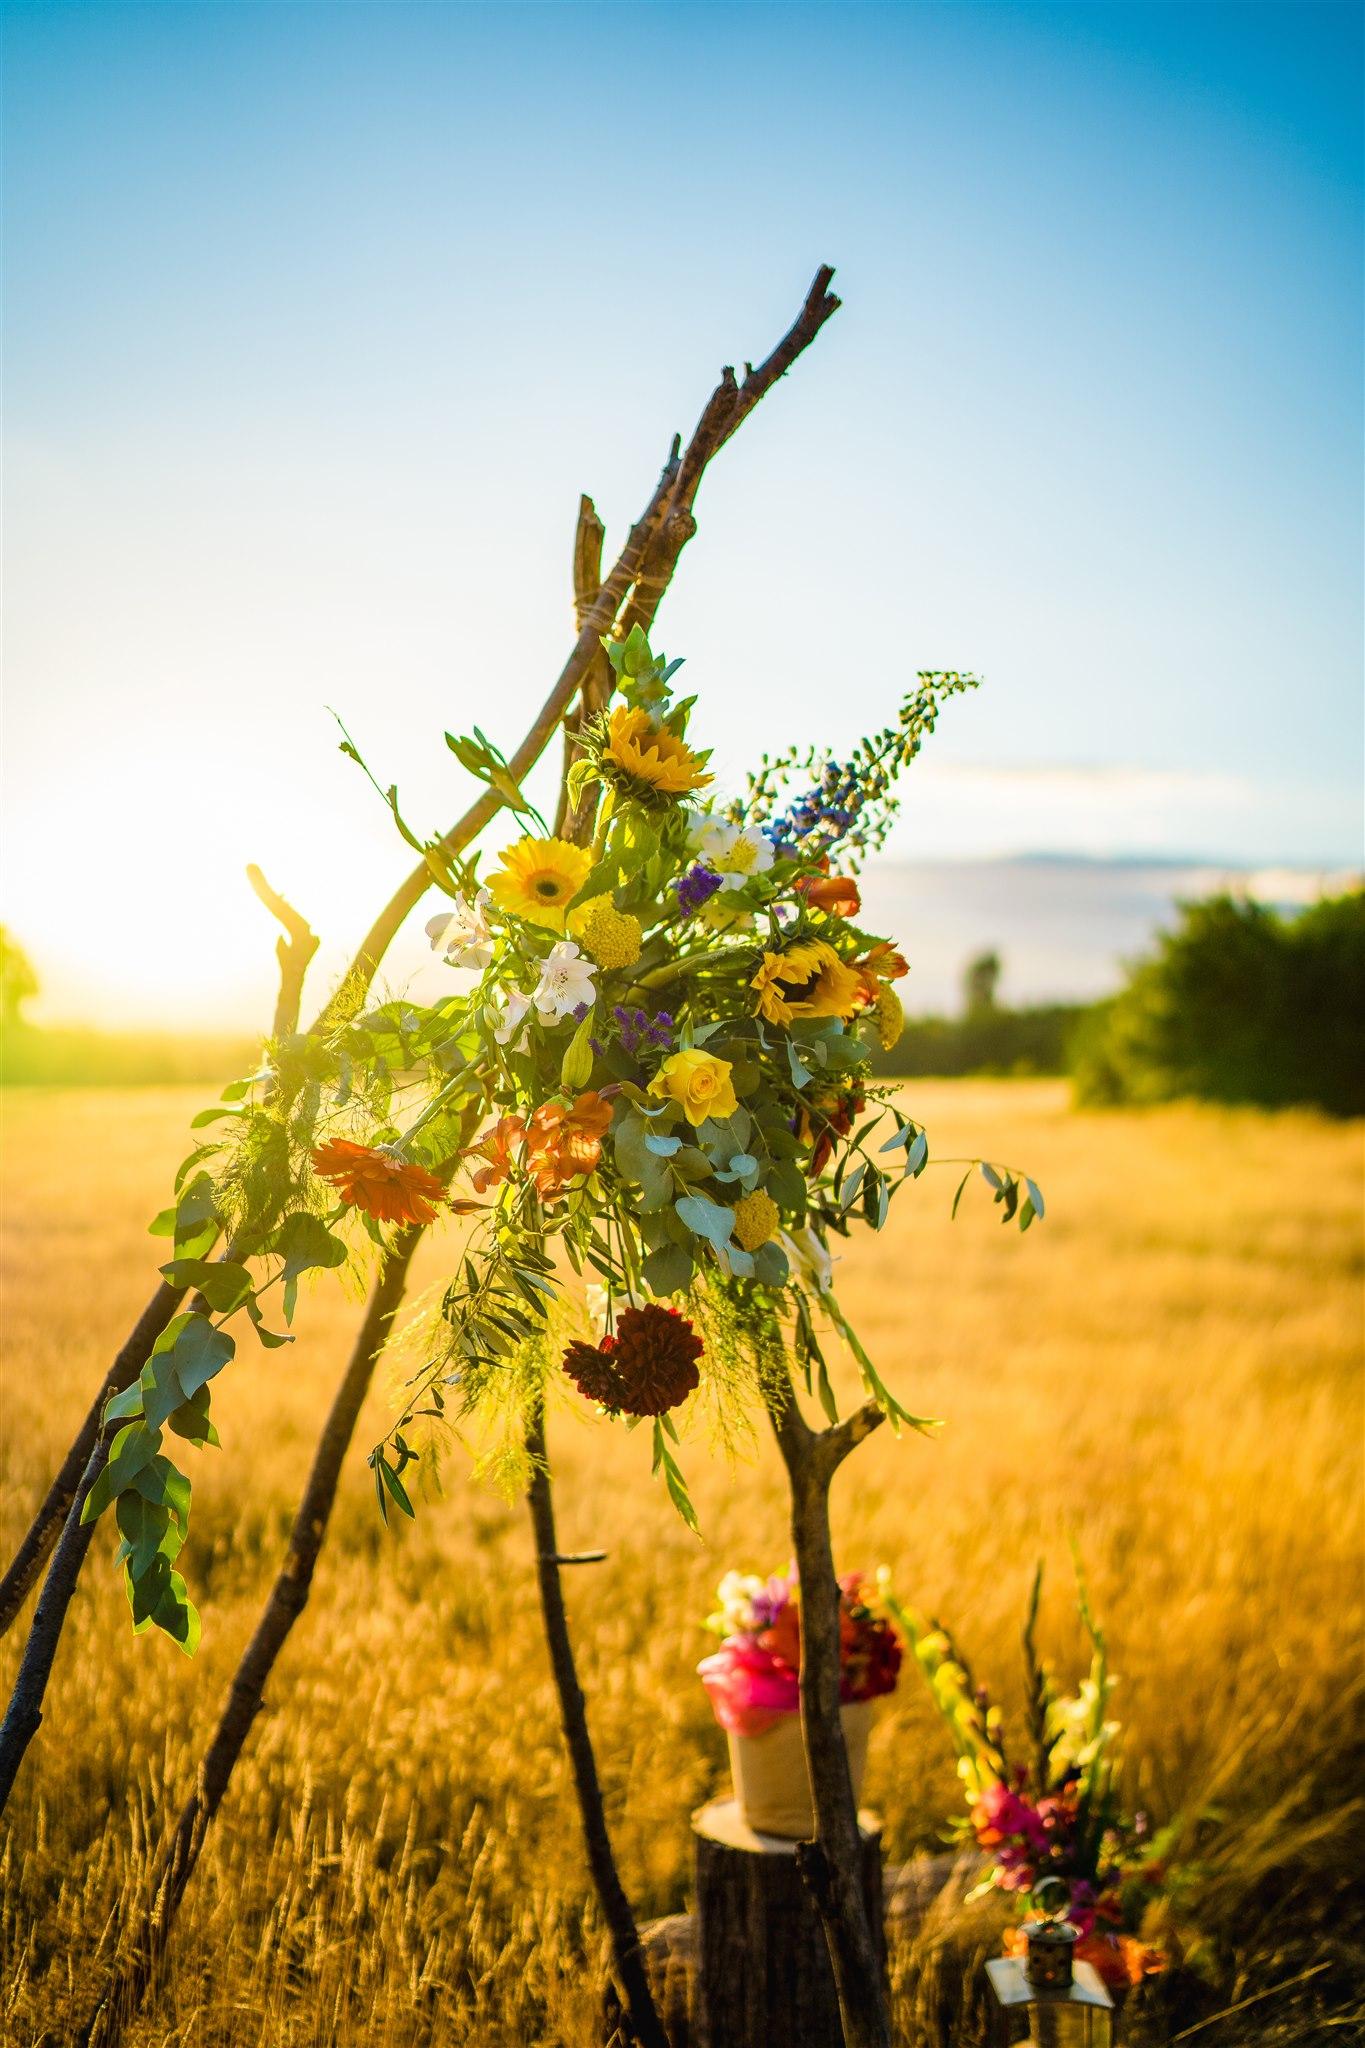 colourful bohemian wedding - 70s wedding - campervan wedding - hippie wedding - DIY wedding ideas - boho wedding styling